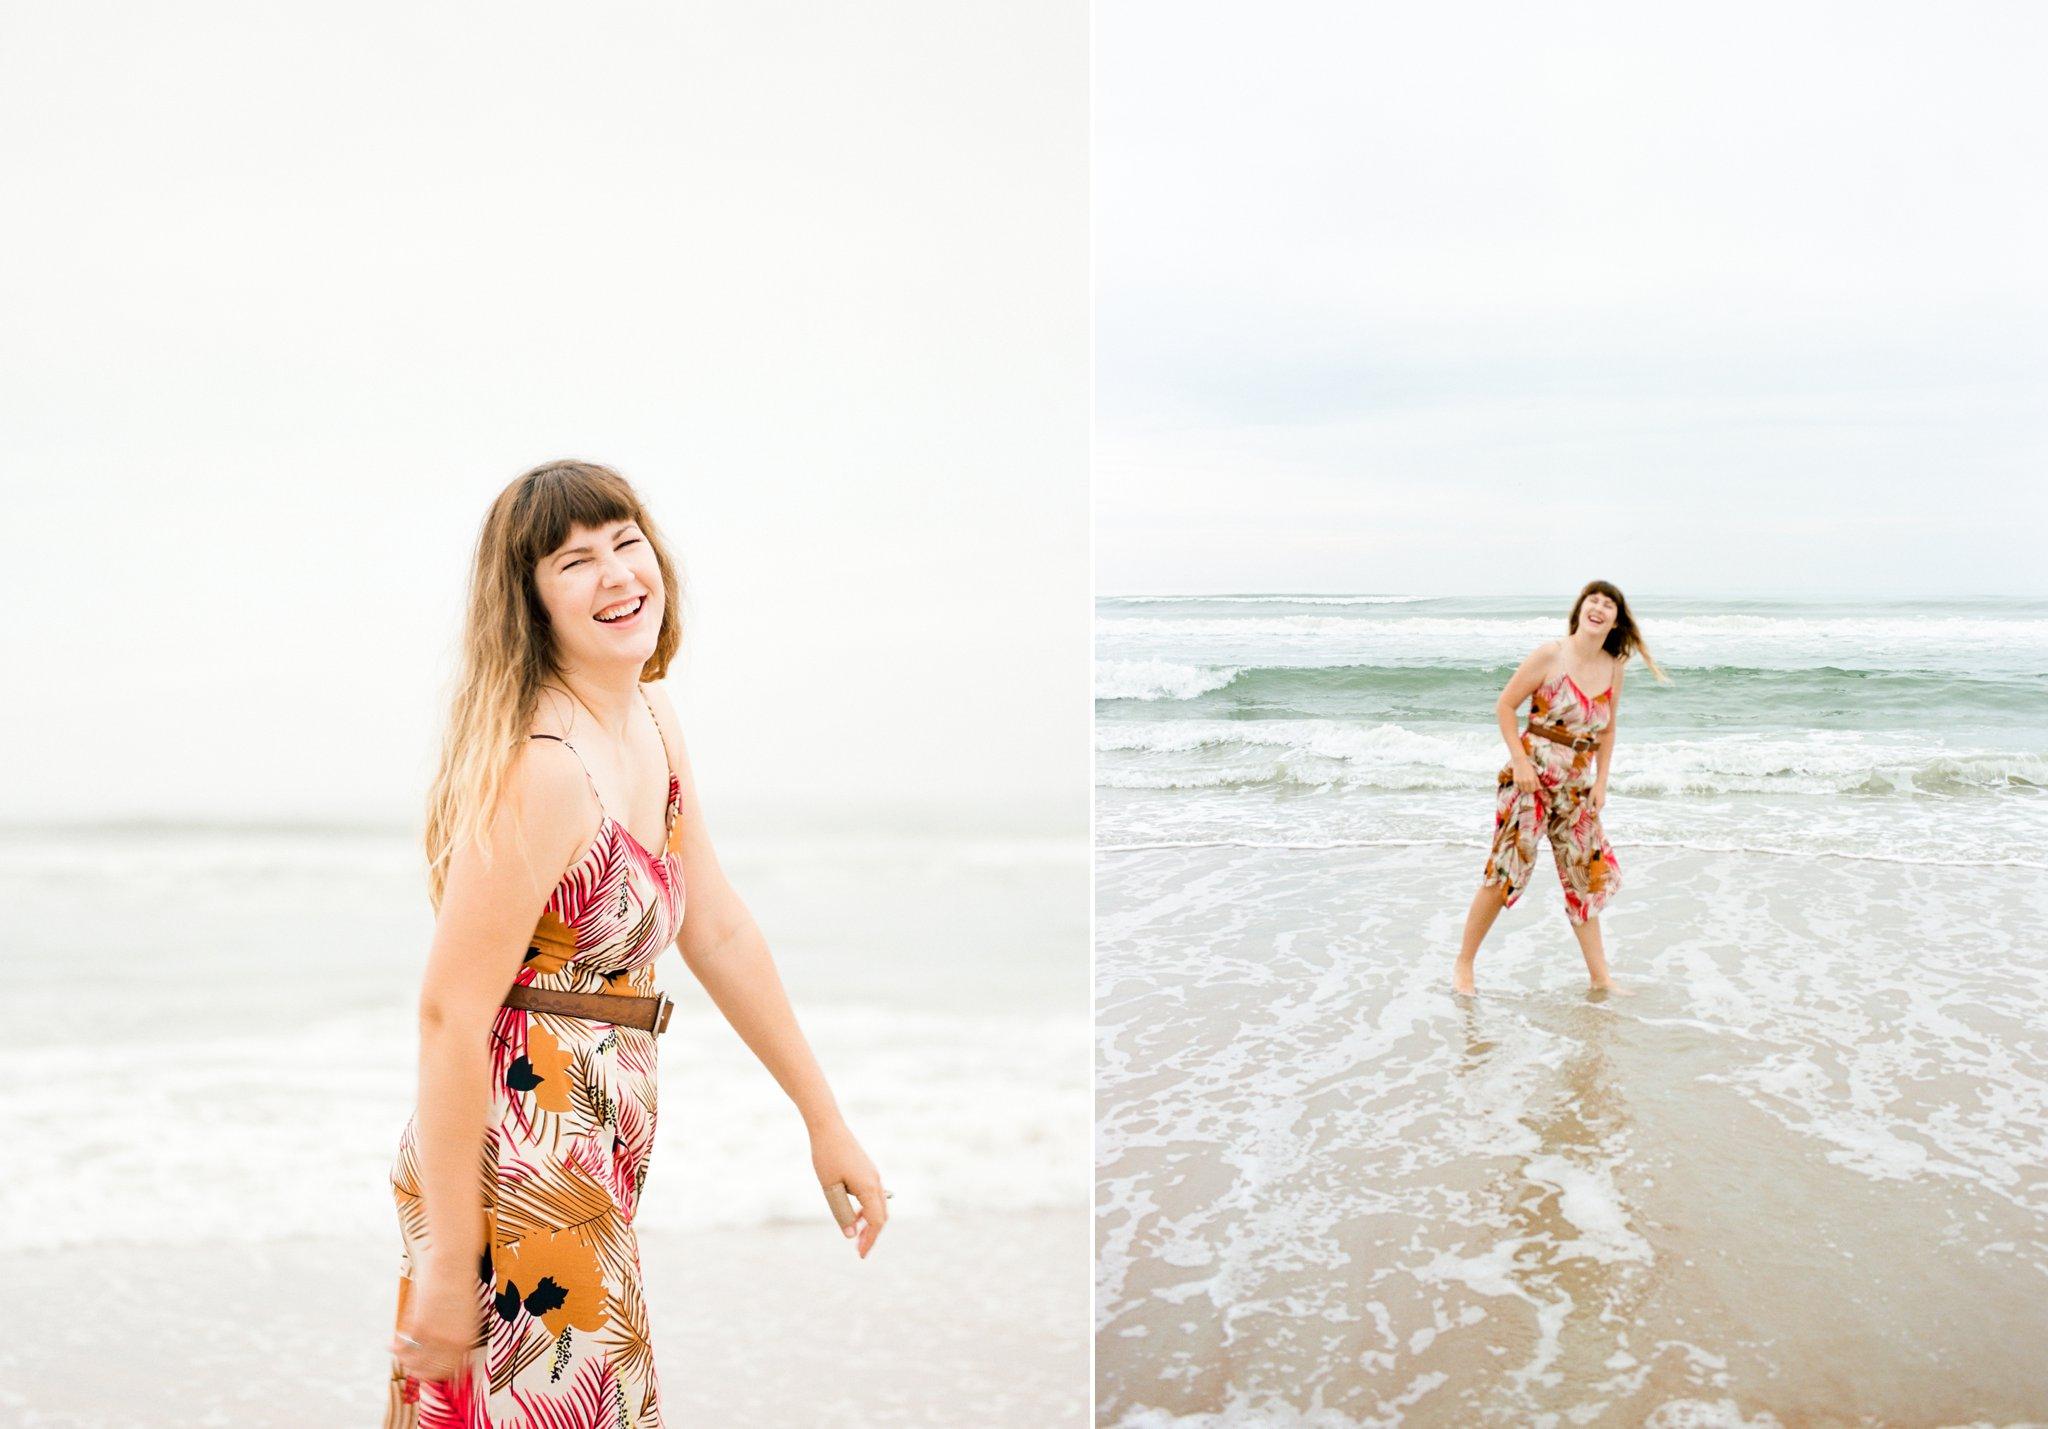 west palm beach branding photographer west palm beach headshot photographer shannon griffin photography_0018.jpg